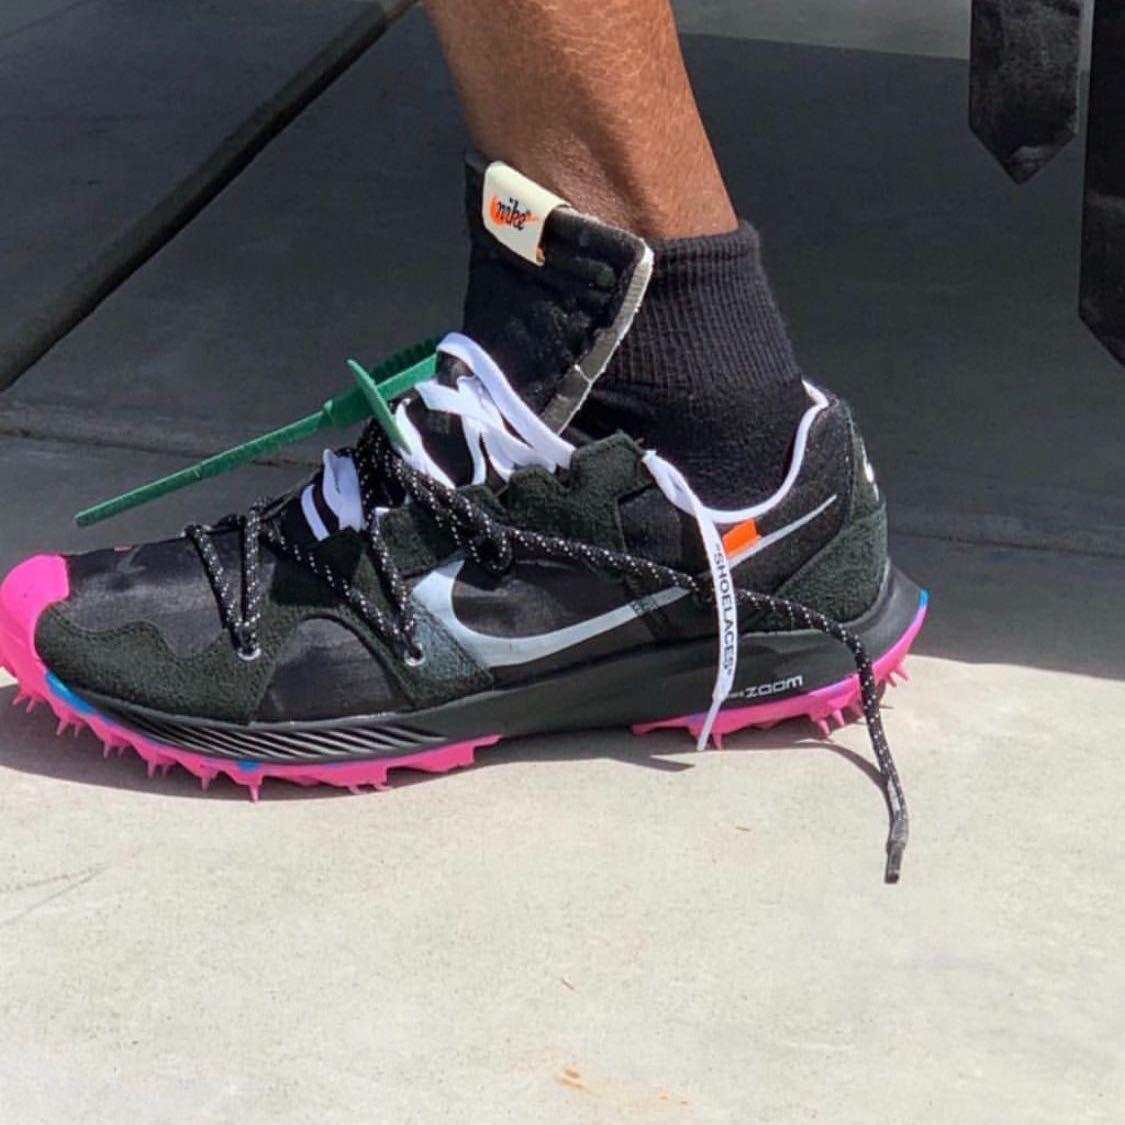 Virgil Abloh 曝光 Off-White™ x Nike 全新聯名鞋款